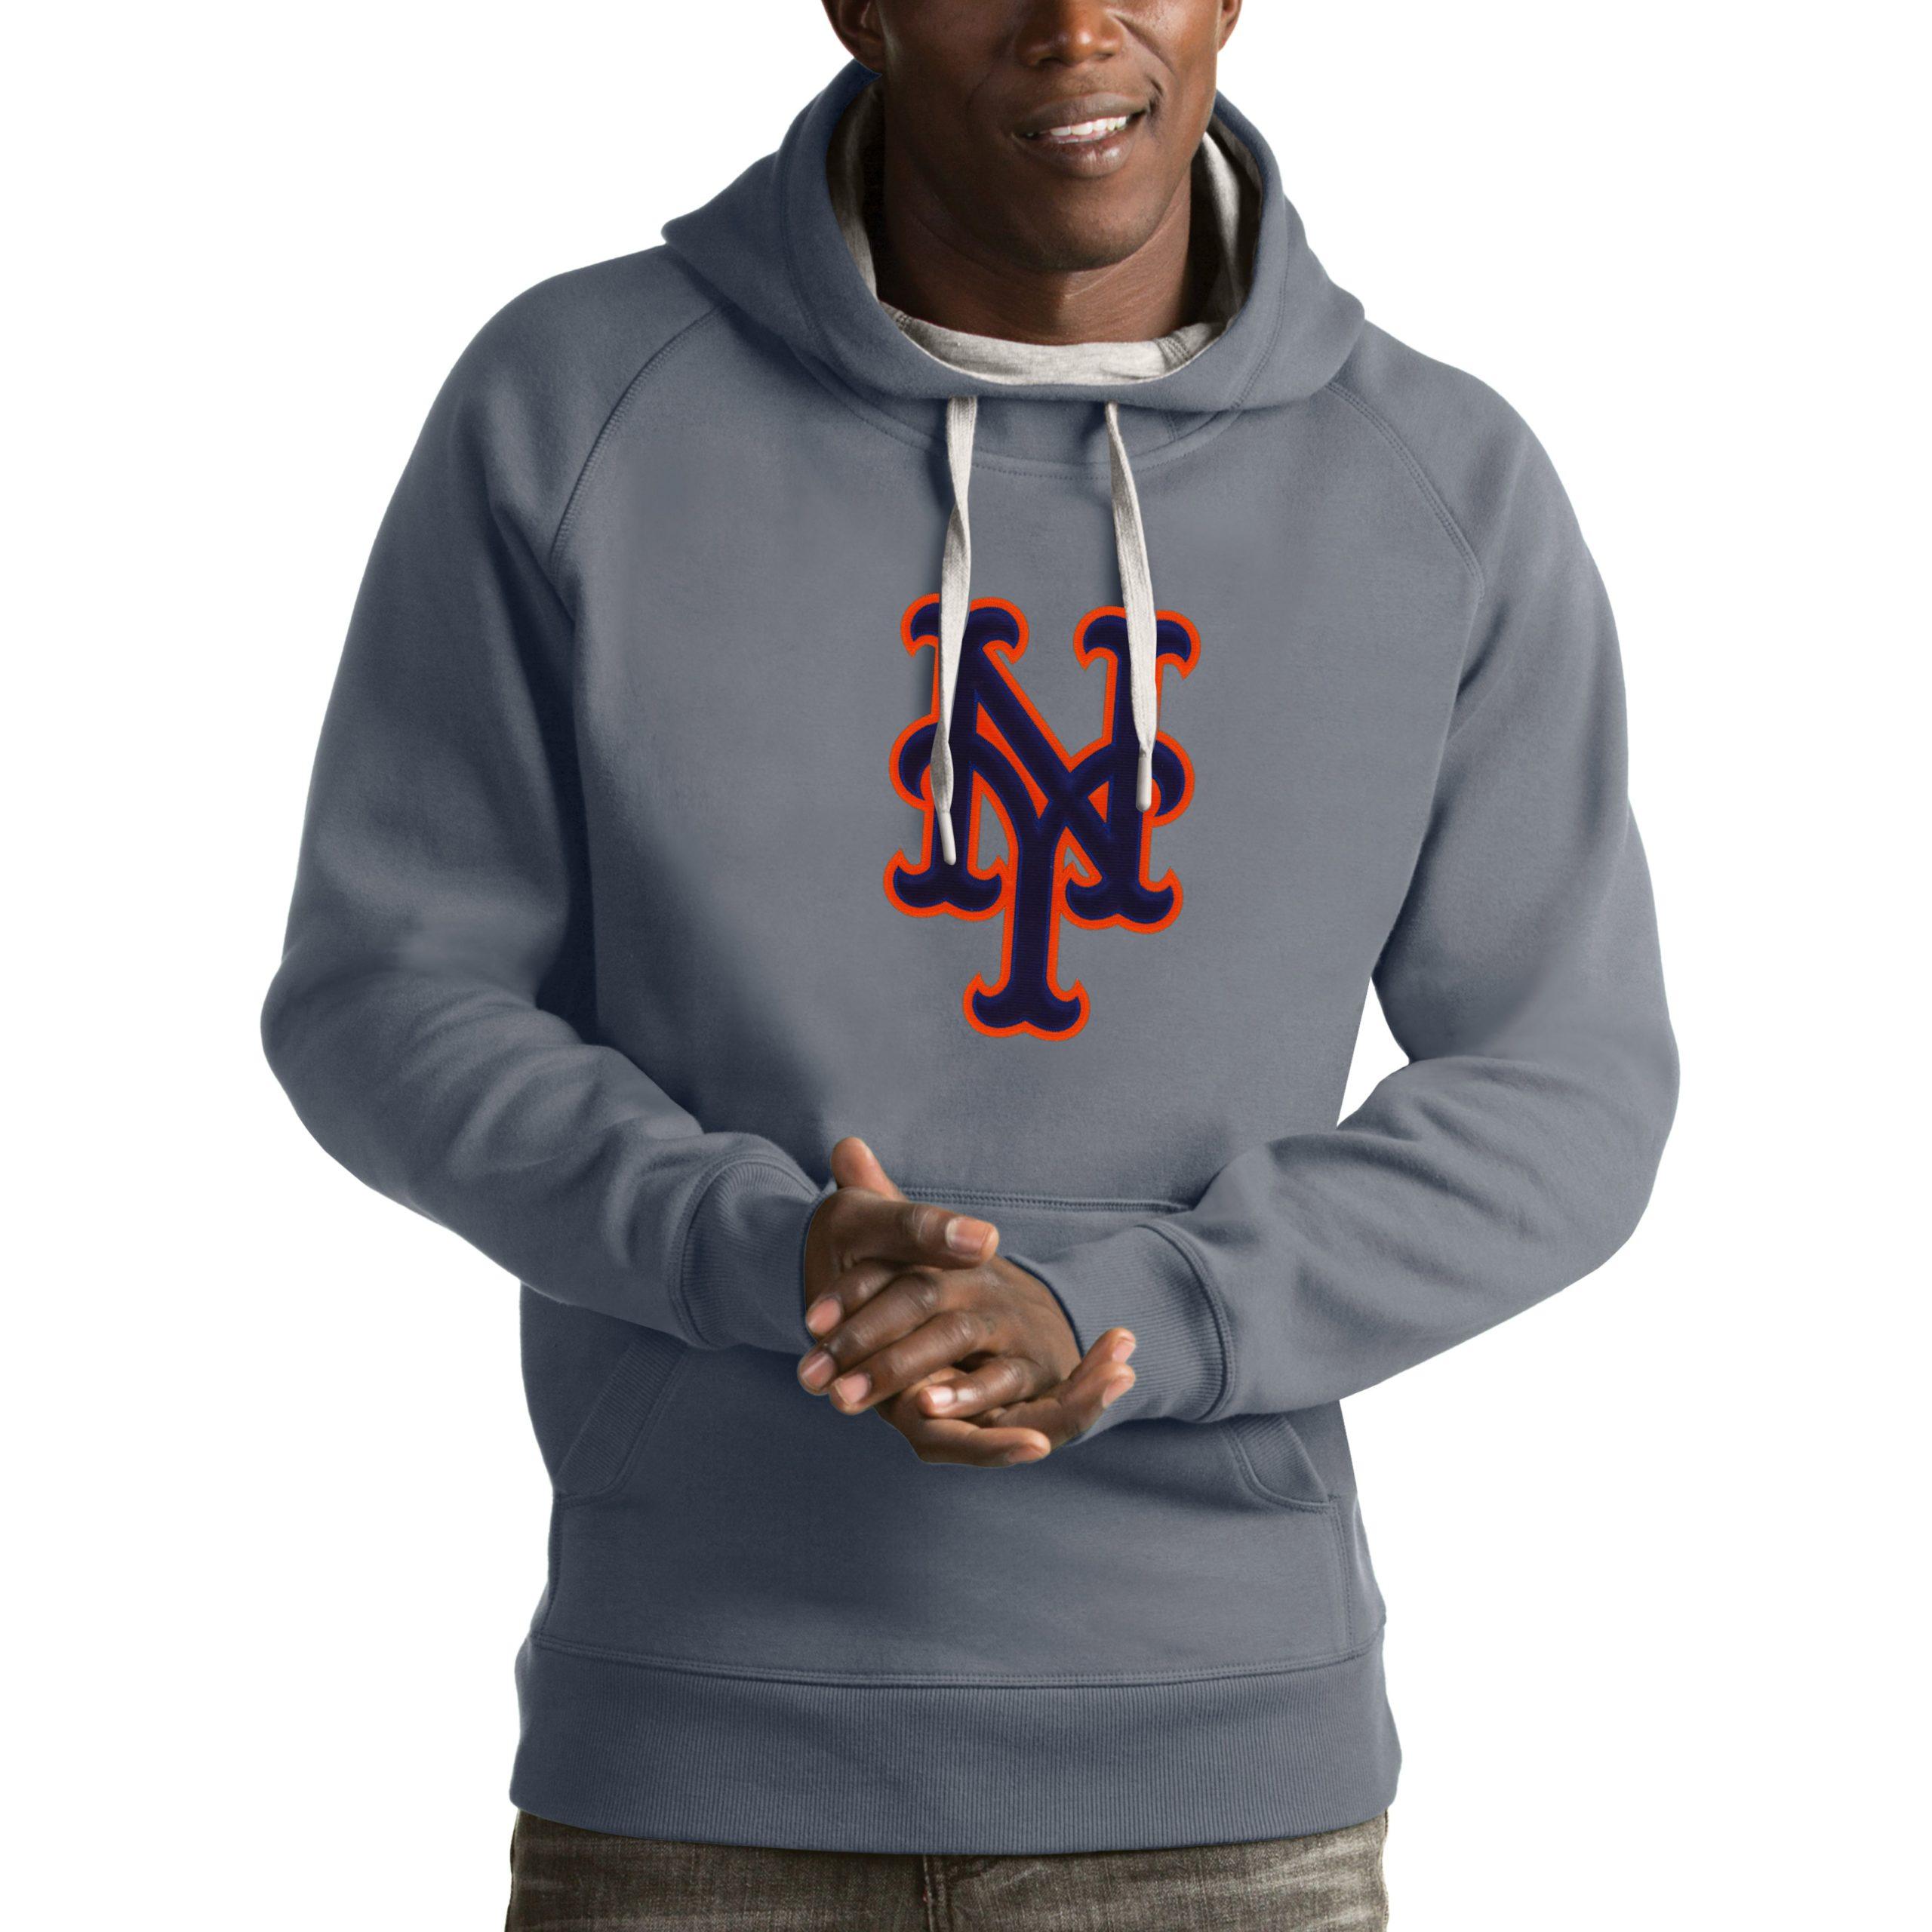 New York Mets Antigua Victory Pullover Hoodie - Heathered Gray